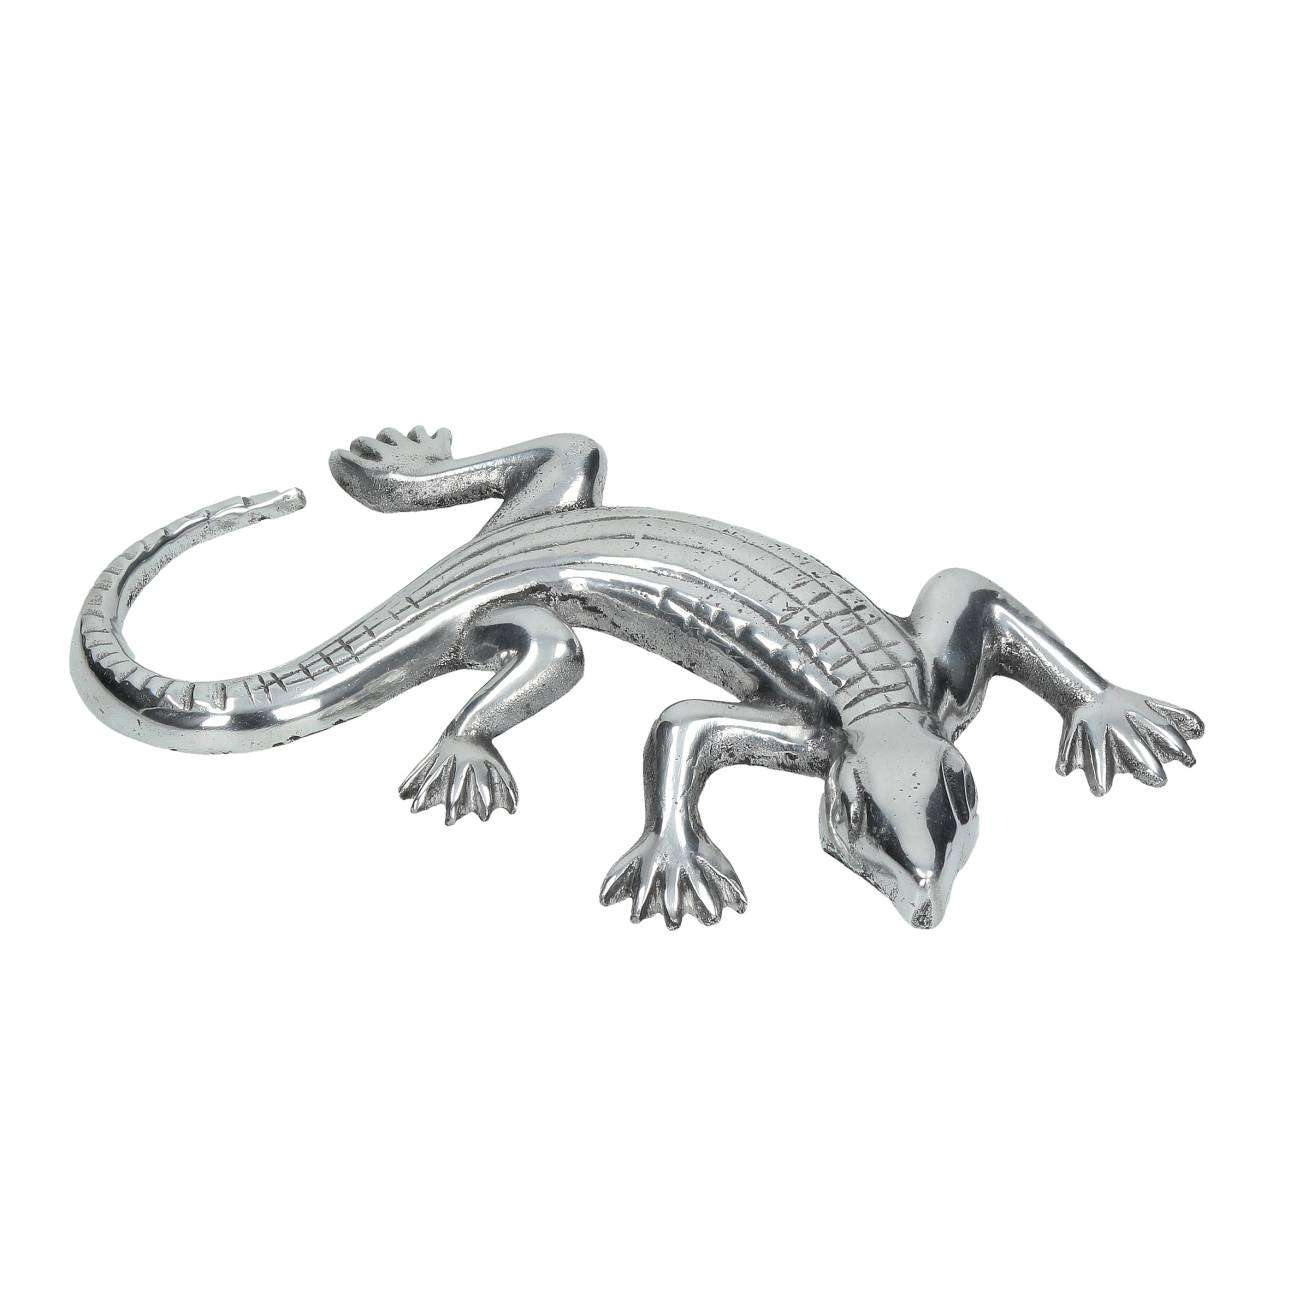 Dekofigur Lizard 28x15x3cm, 28 × 15 × 3 cm | Dekoration > Figuren und Skulpturen > Figuren | Dekoria